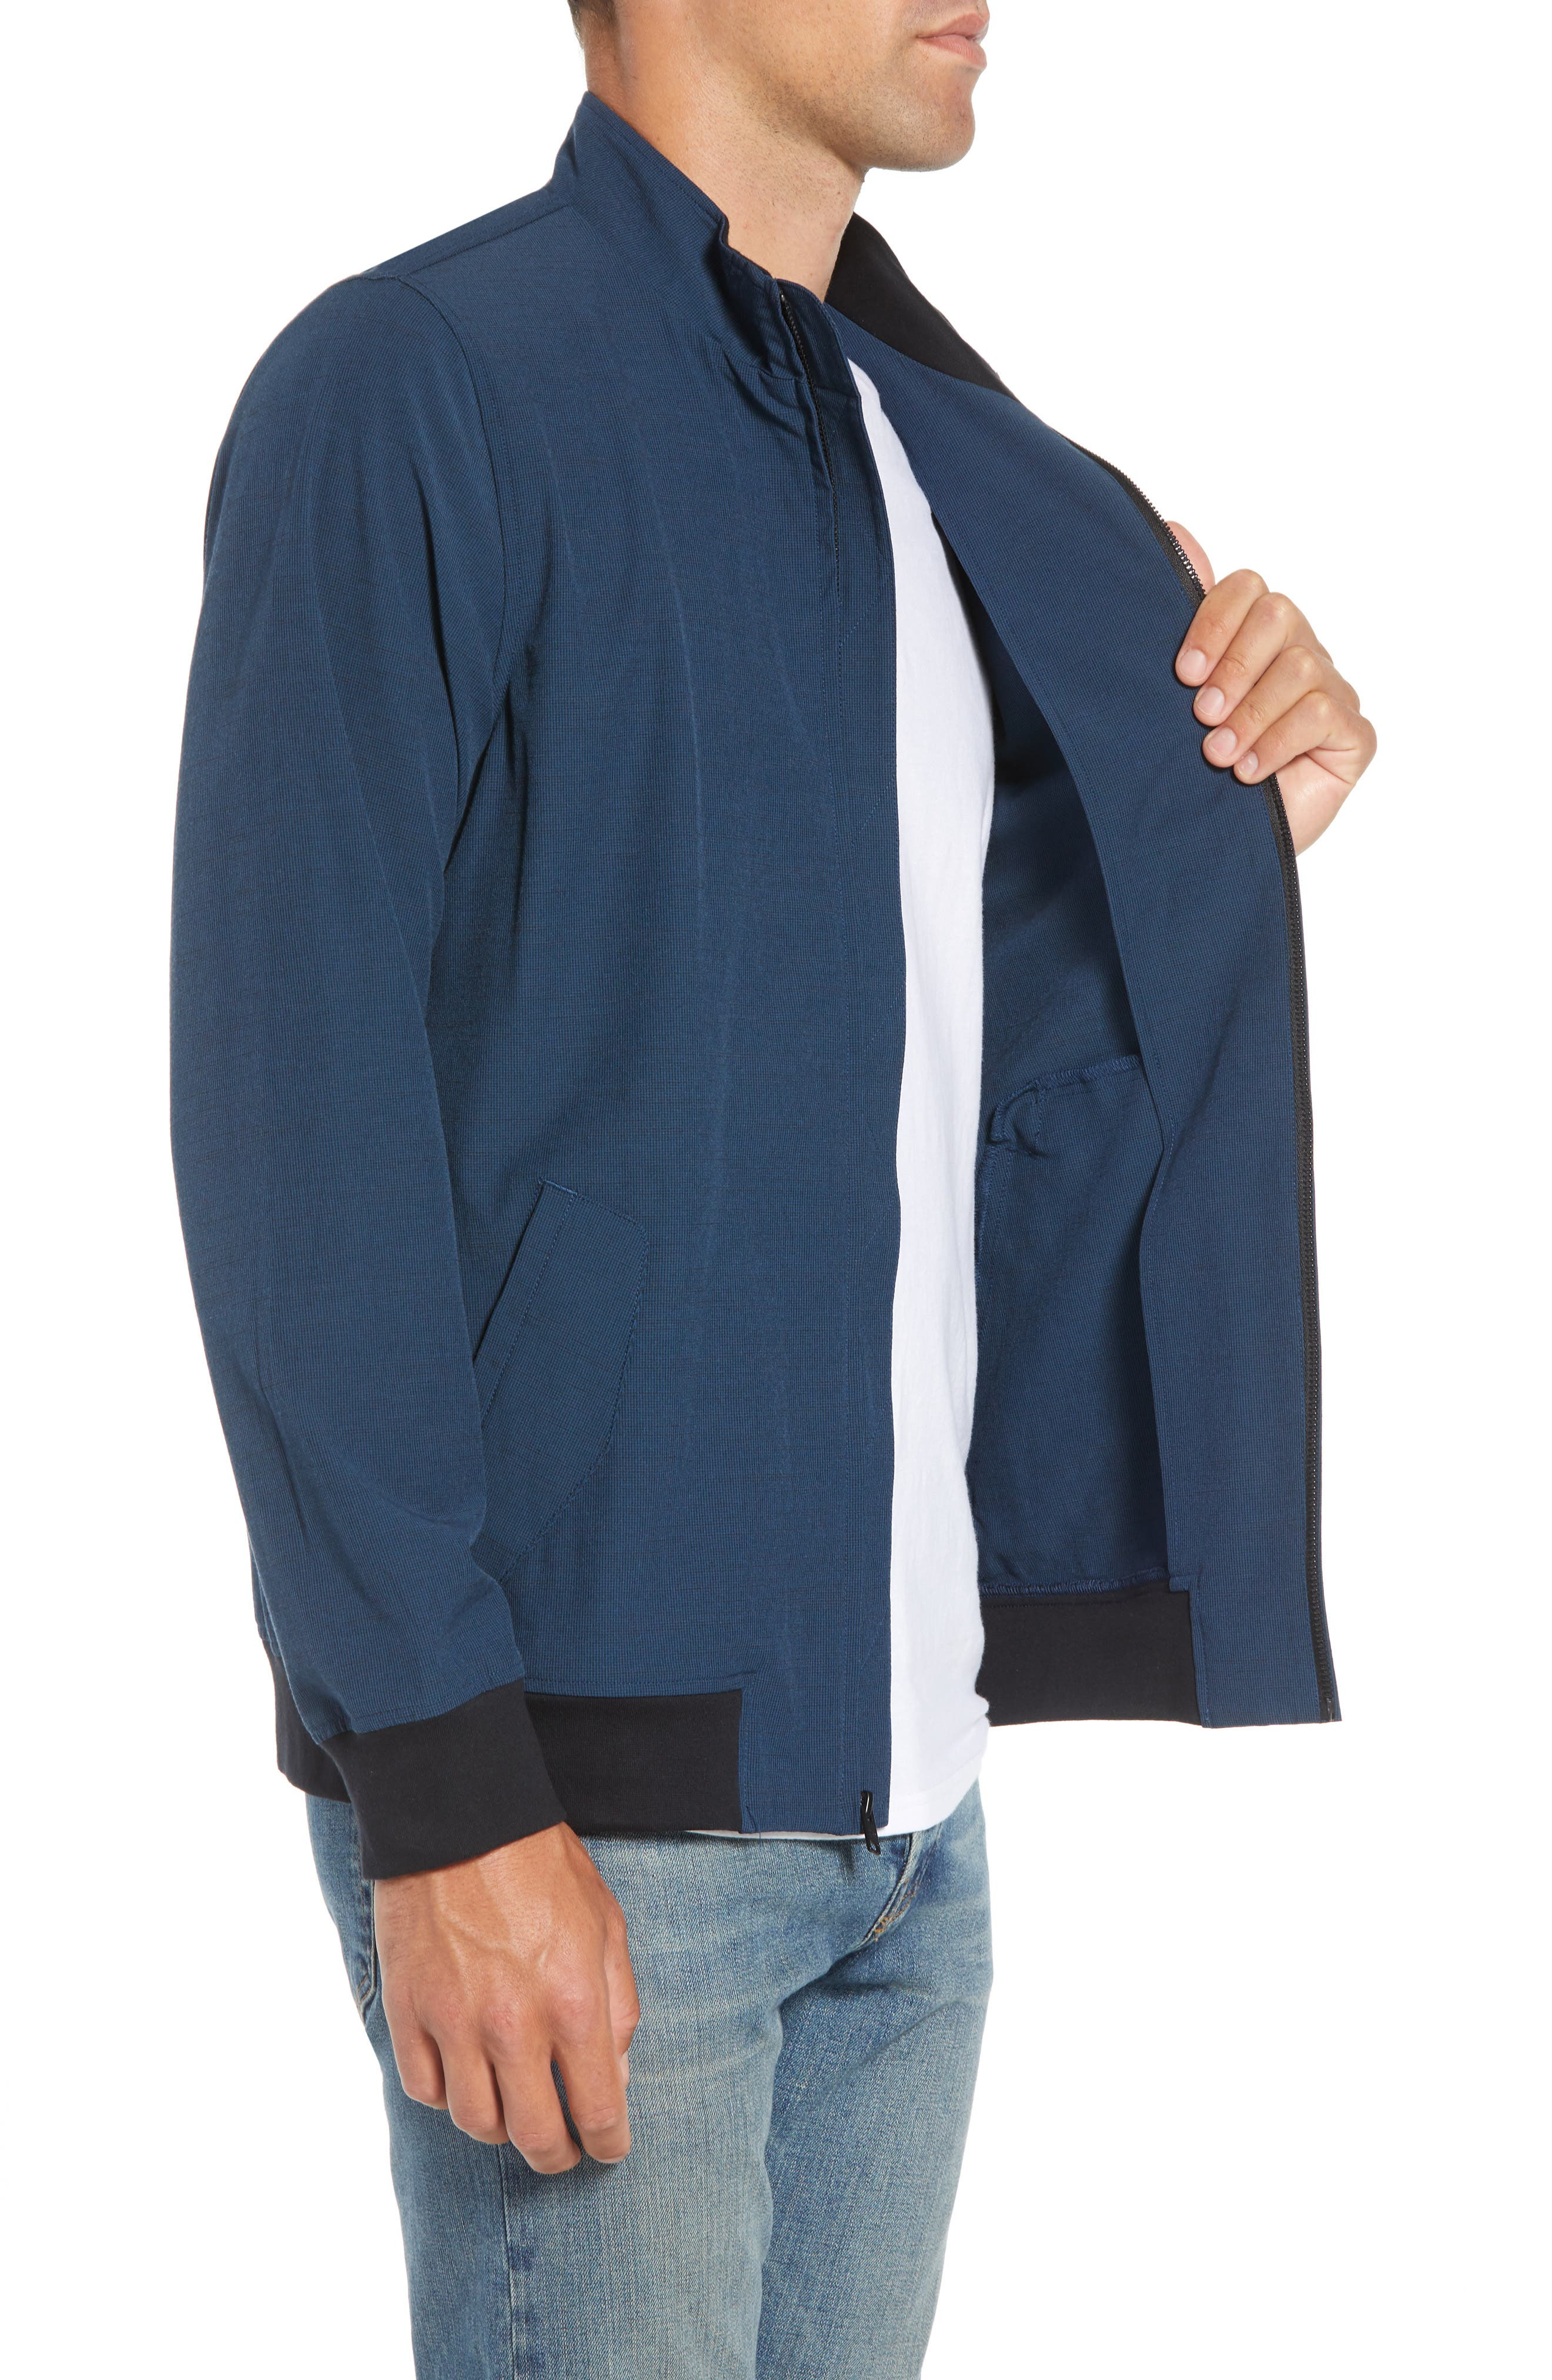 Ridgley Regular Fit Jacket,                             Alternate thumbnail 3, color,                             BLUE WING TEAL/ BLACK